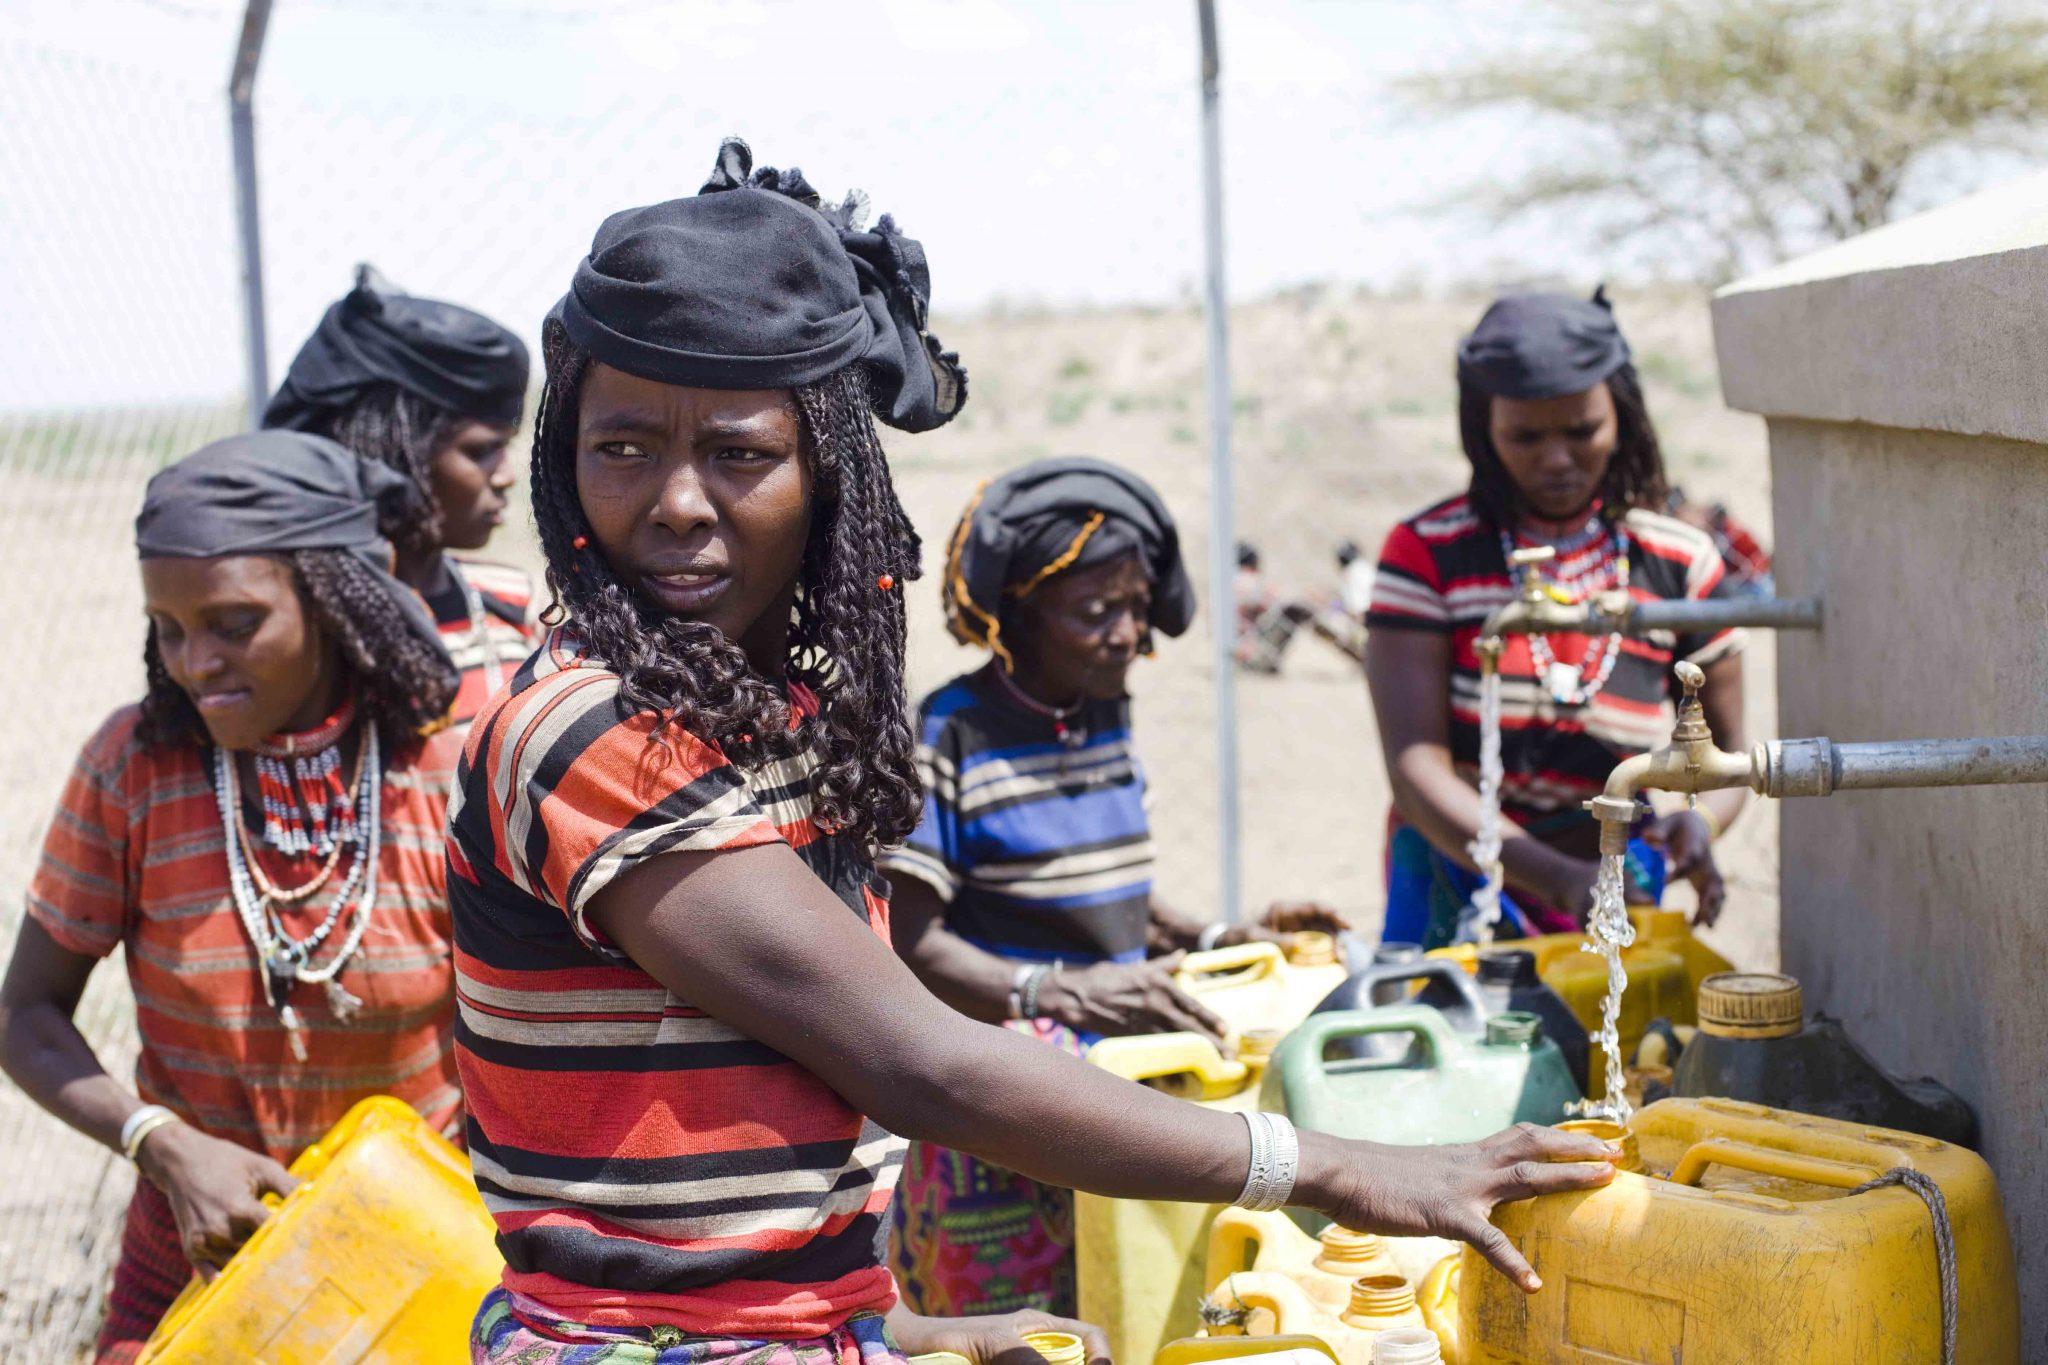 Finding clean water | borjasantosporras.org